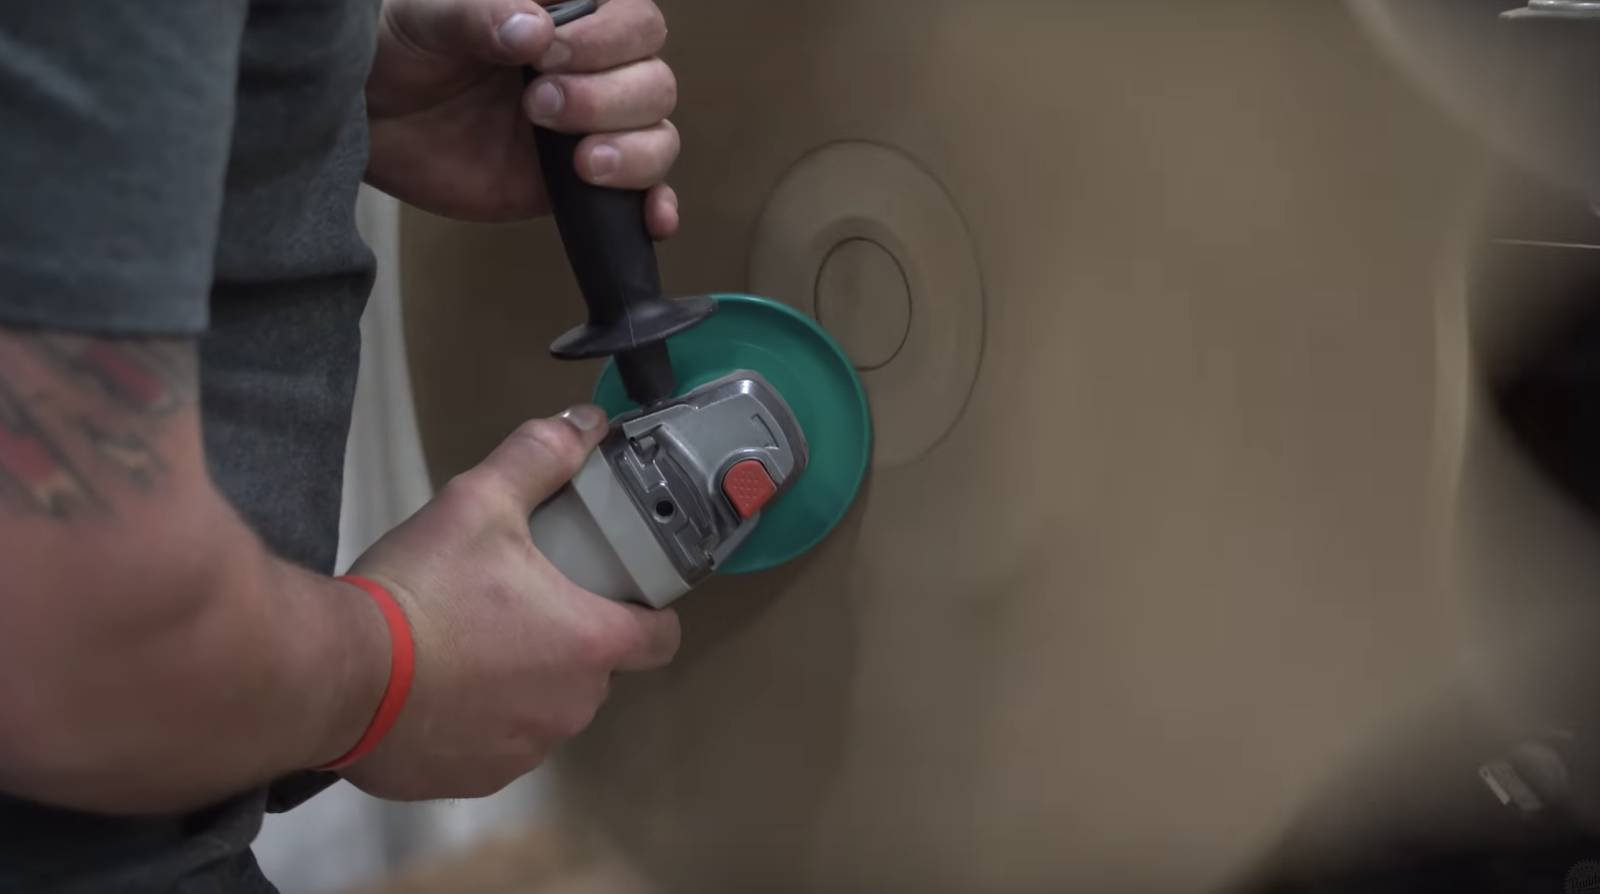 John malecki uses angle grinder on a turning piece of wood